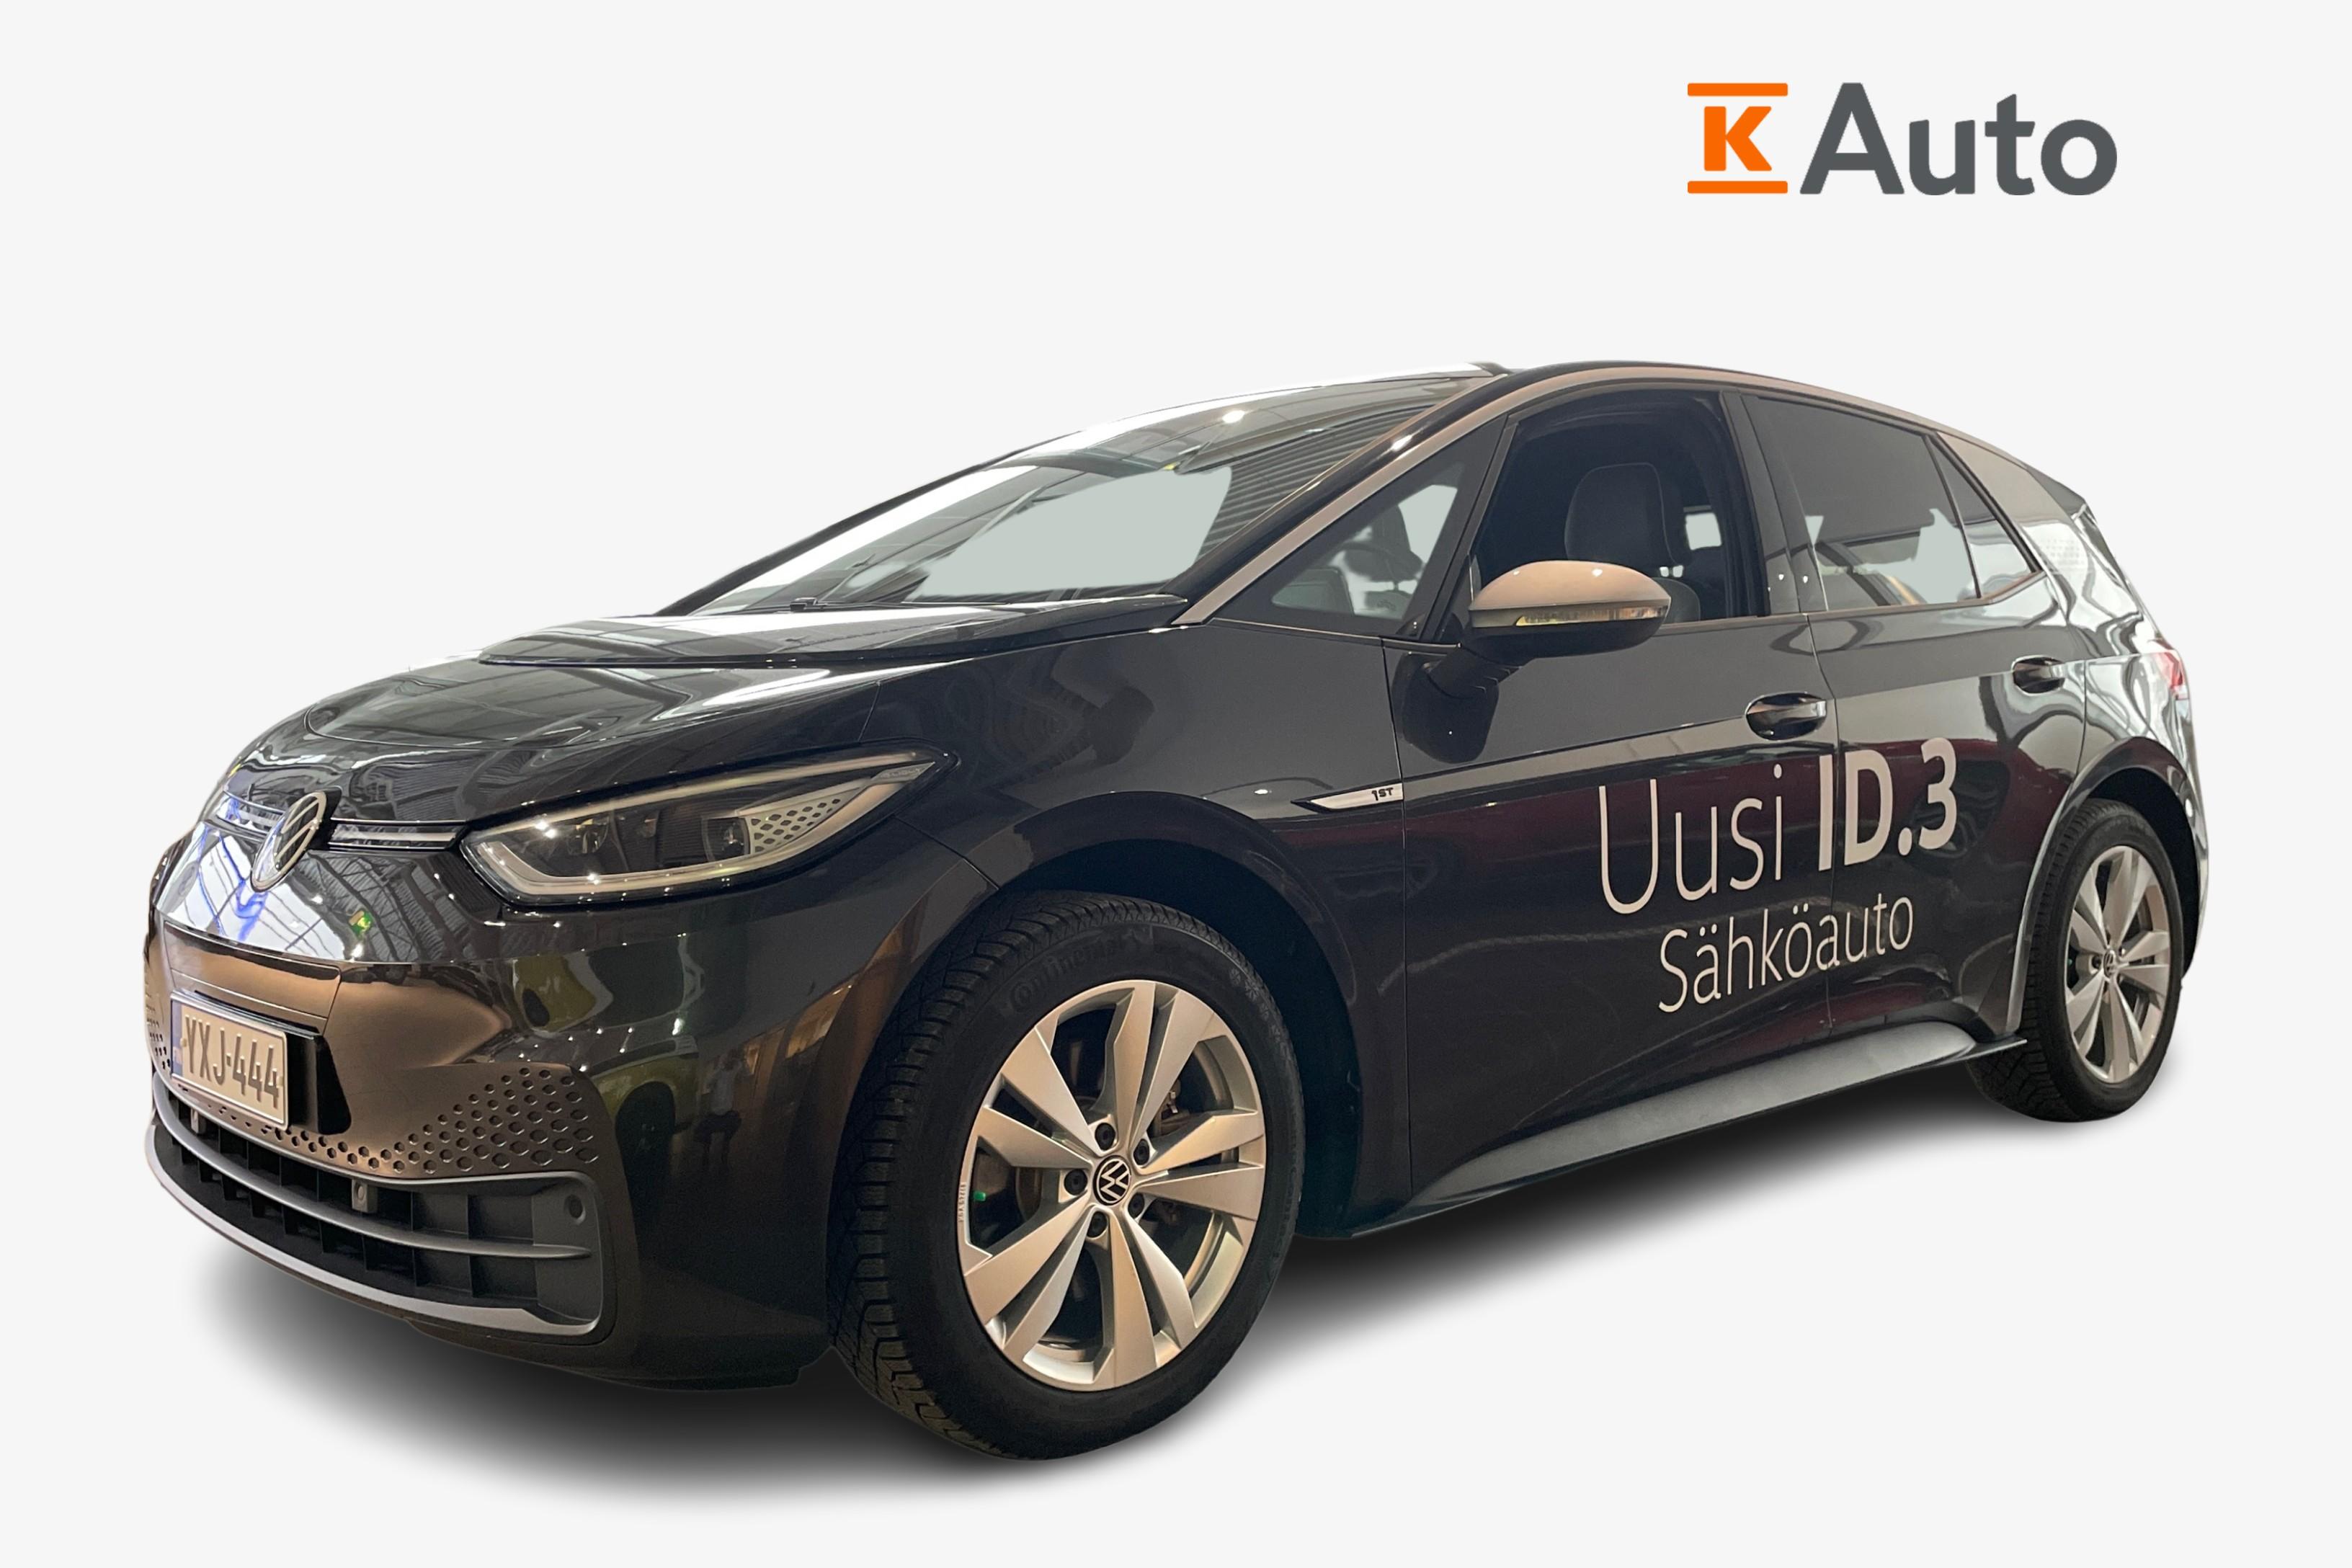 Volkswagen ID.3 1ST Plus 150 kW, akku 58 kWh